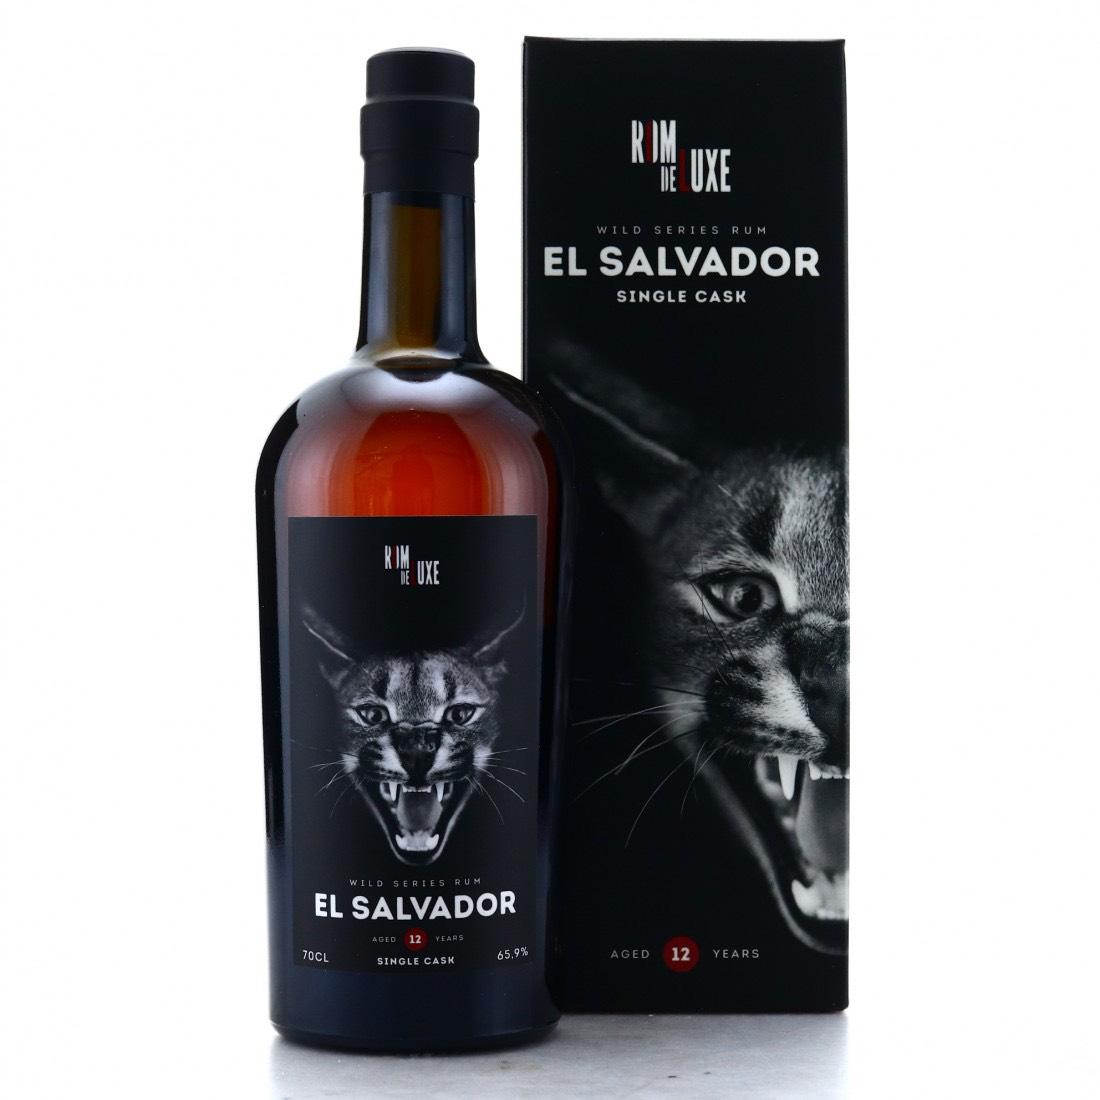 Bottle image of Wild Series Rum El Salvador No. 10